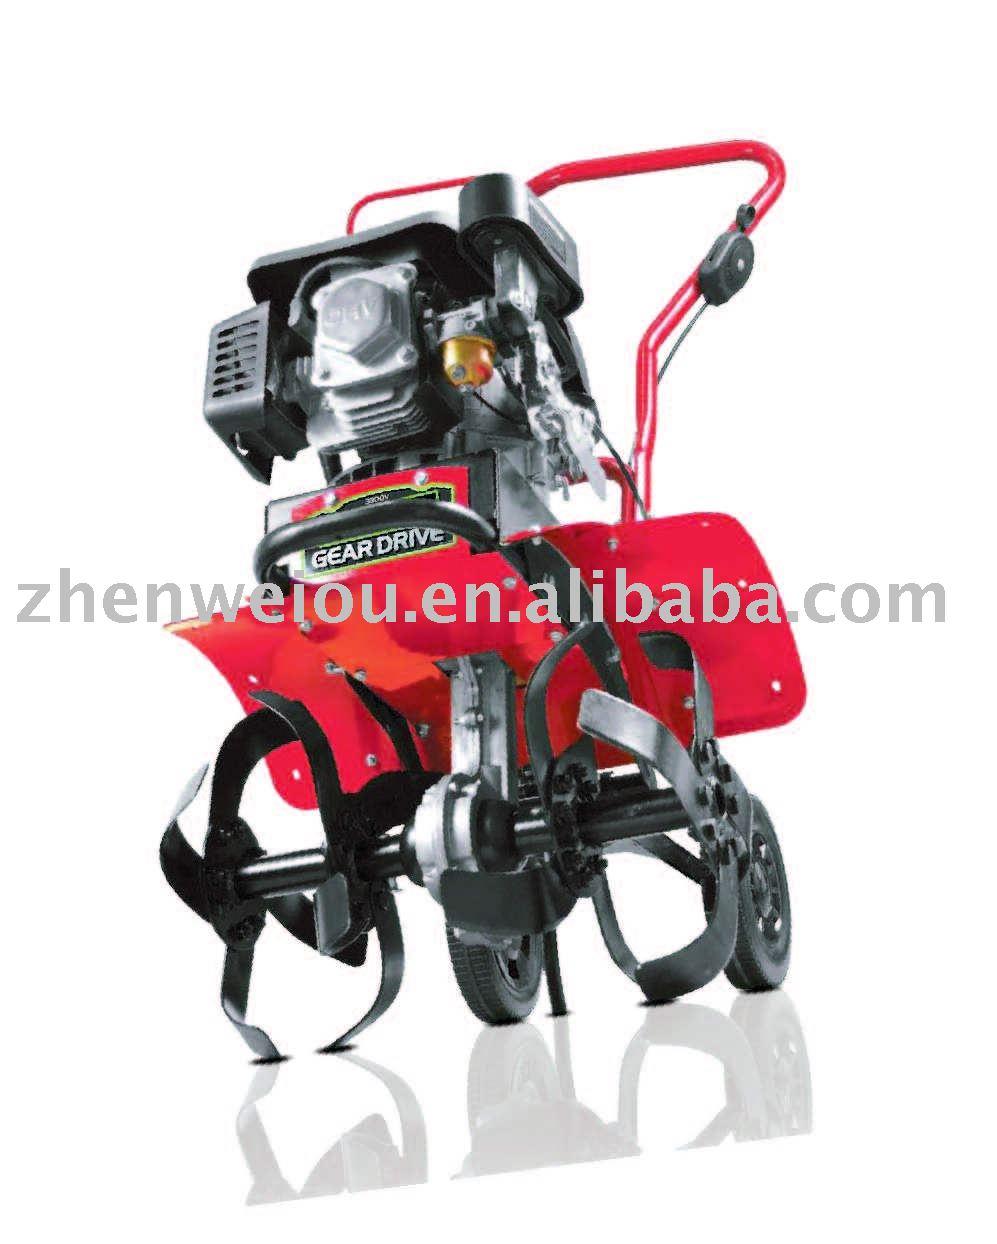 4-Cycle 176cc Viper engine